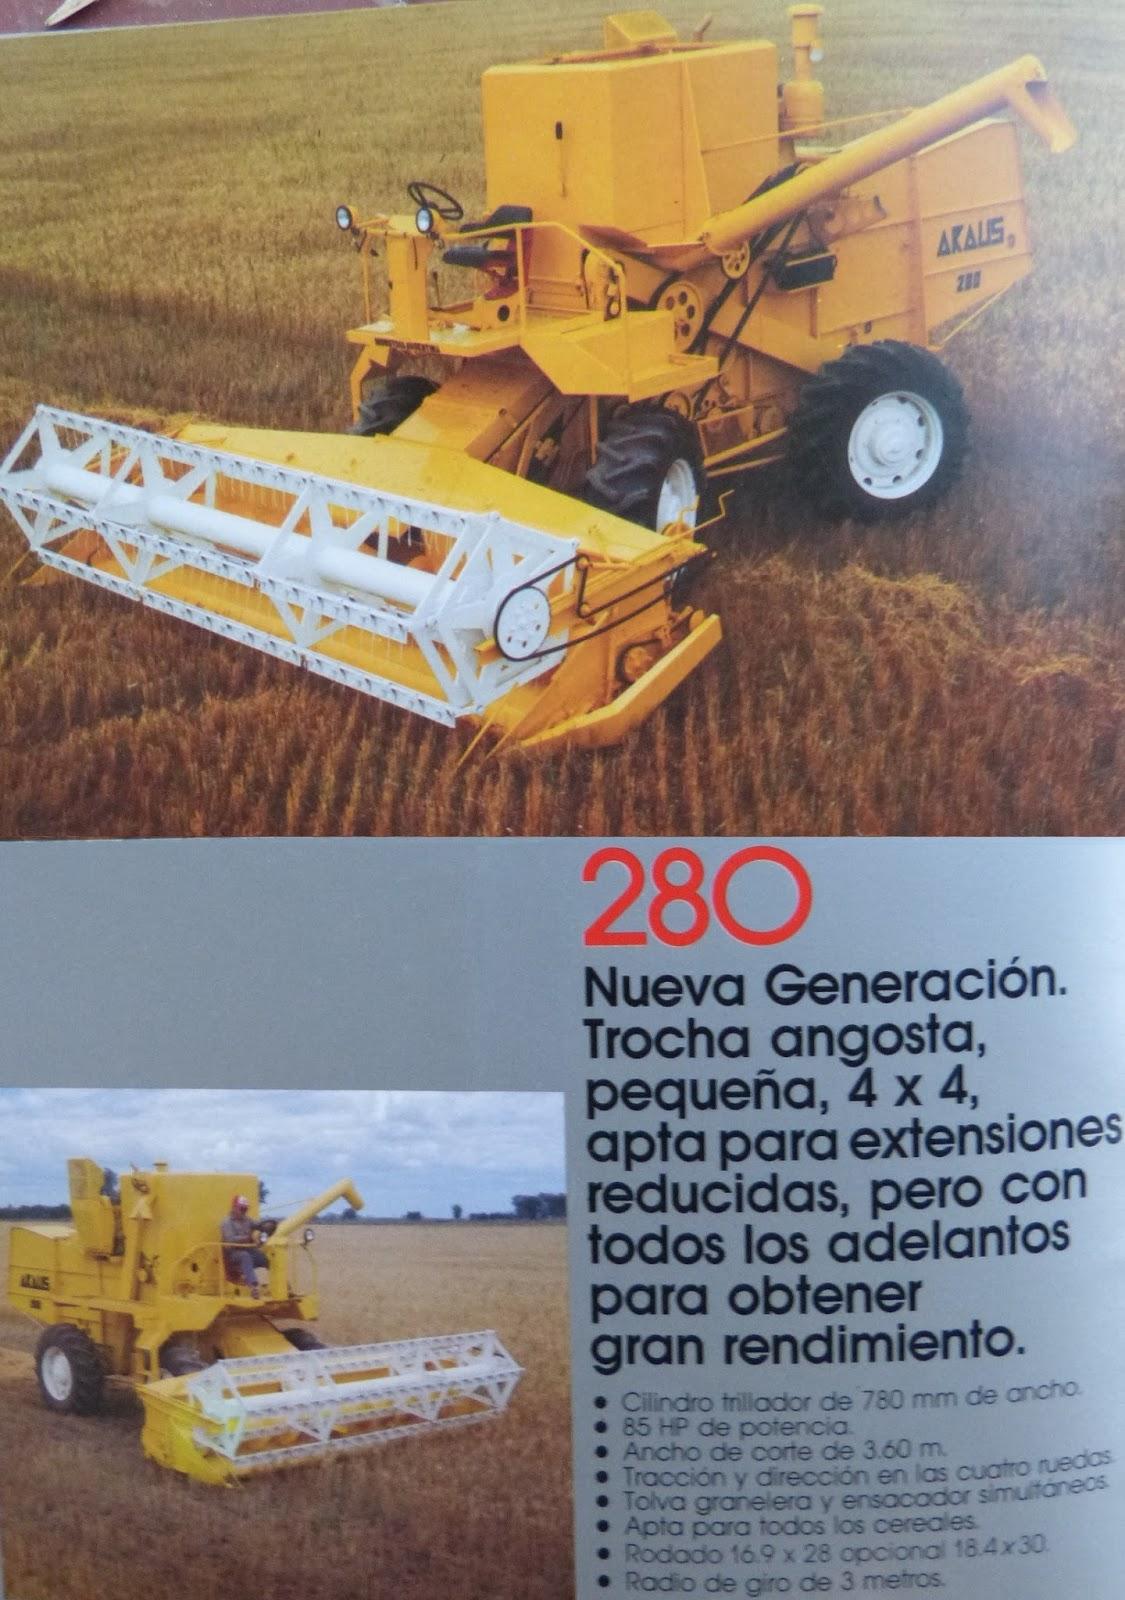 bd6773afff7f ... Araus 280 combine brochure